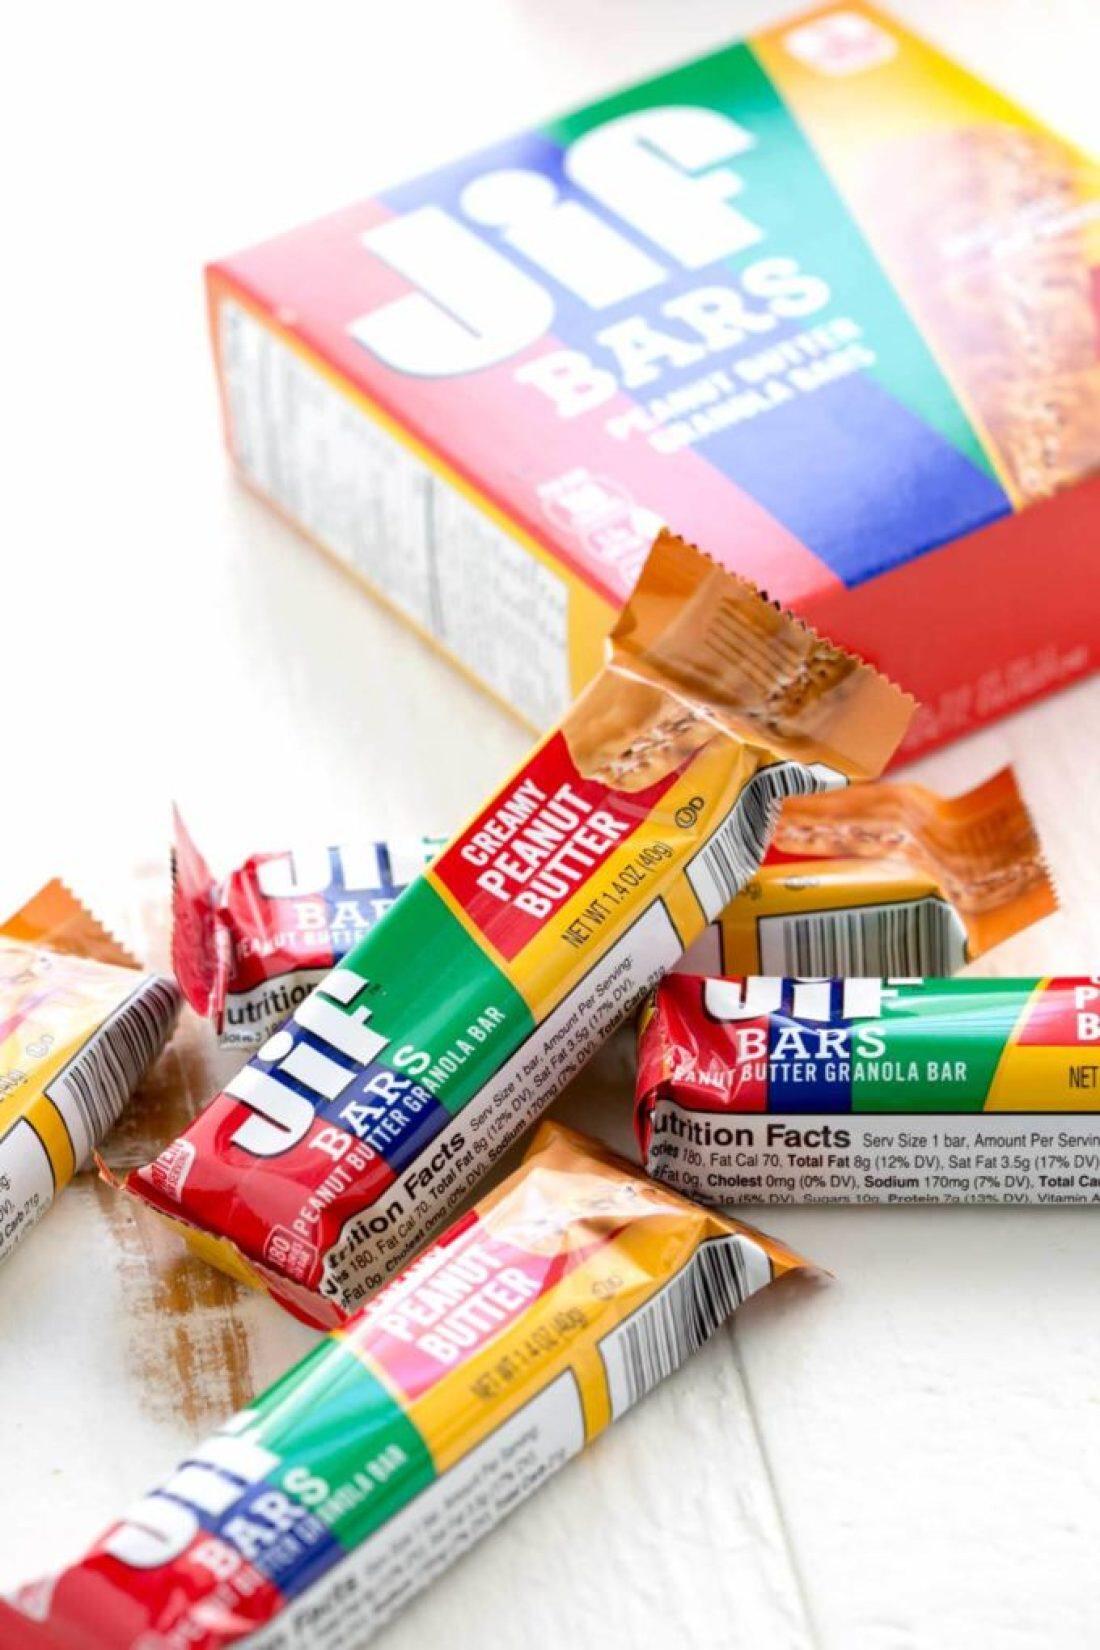 Easy peanut butter JIF bars